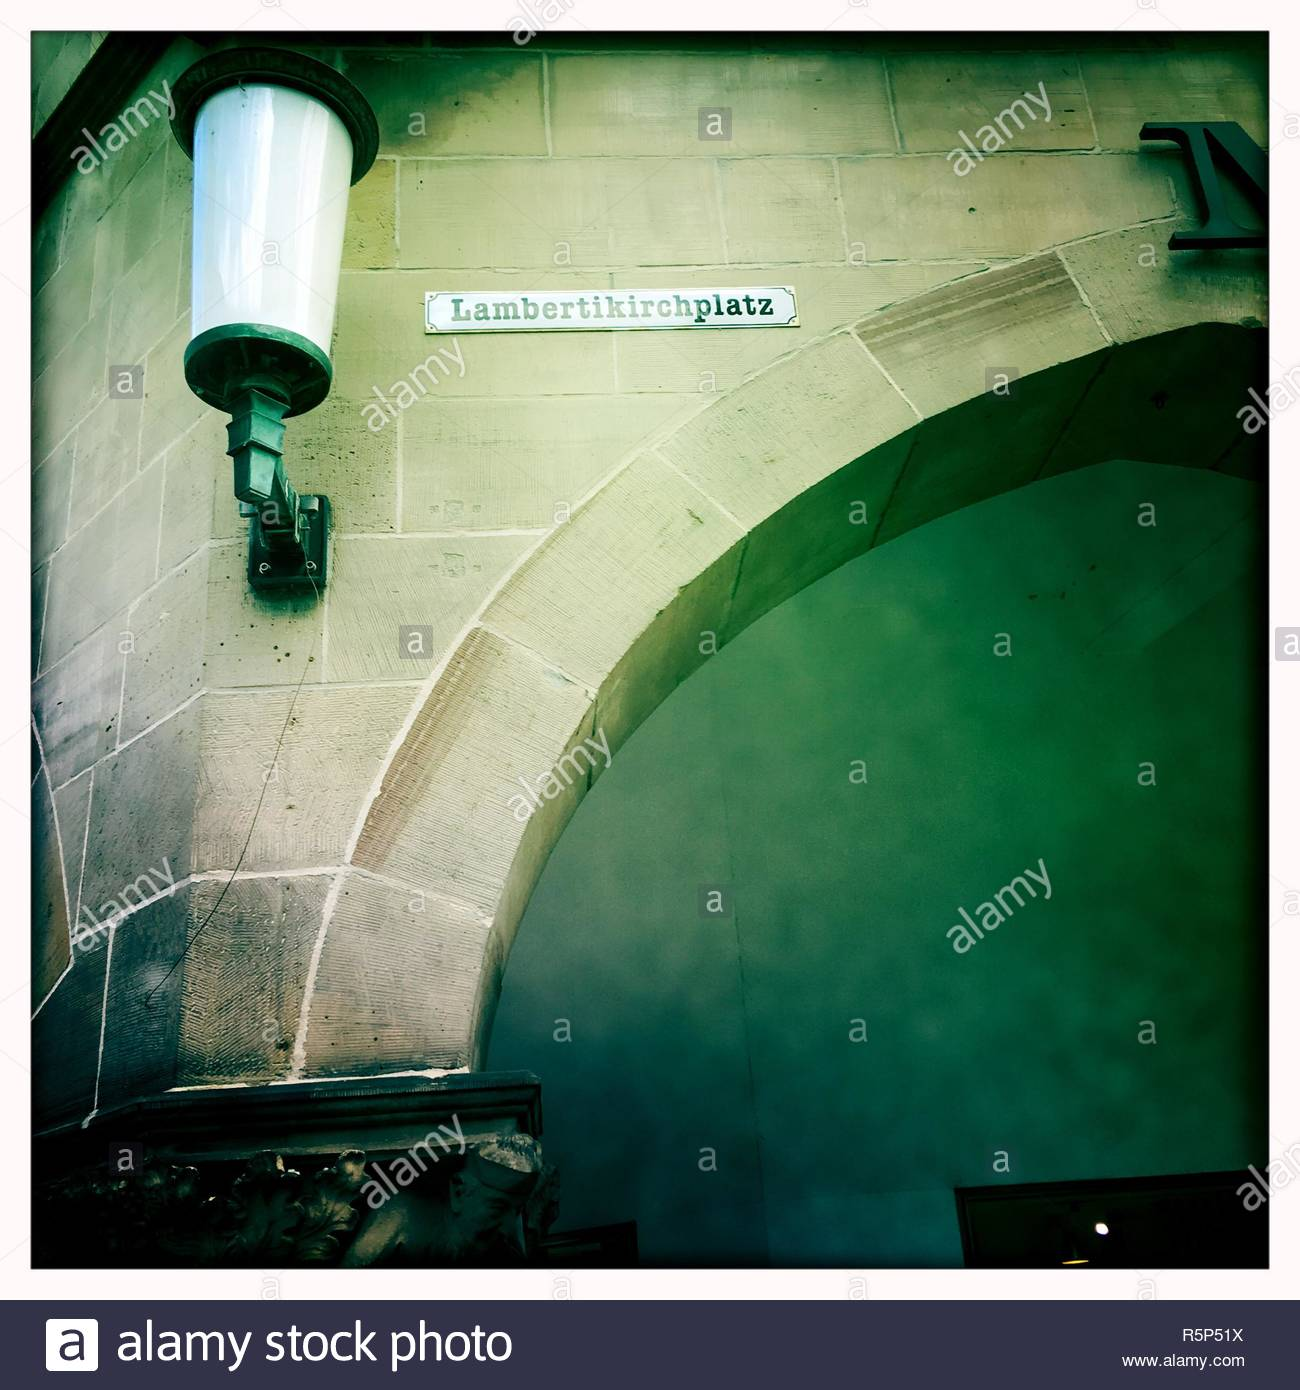 MŸnster Lambertikirchplatz NRW Deutschland - Stock Image